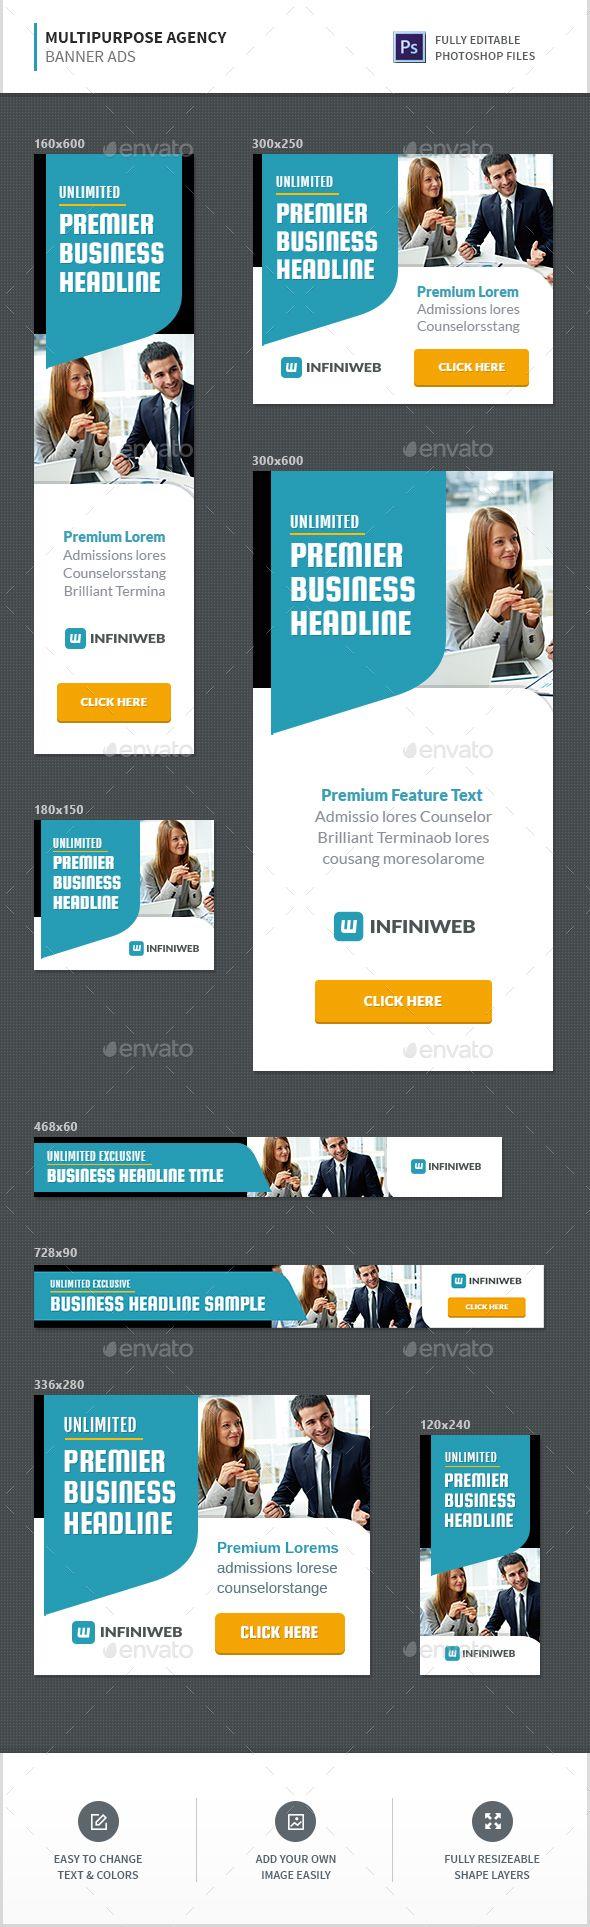 Design banner template - Multipurpose Agency Banners